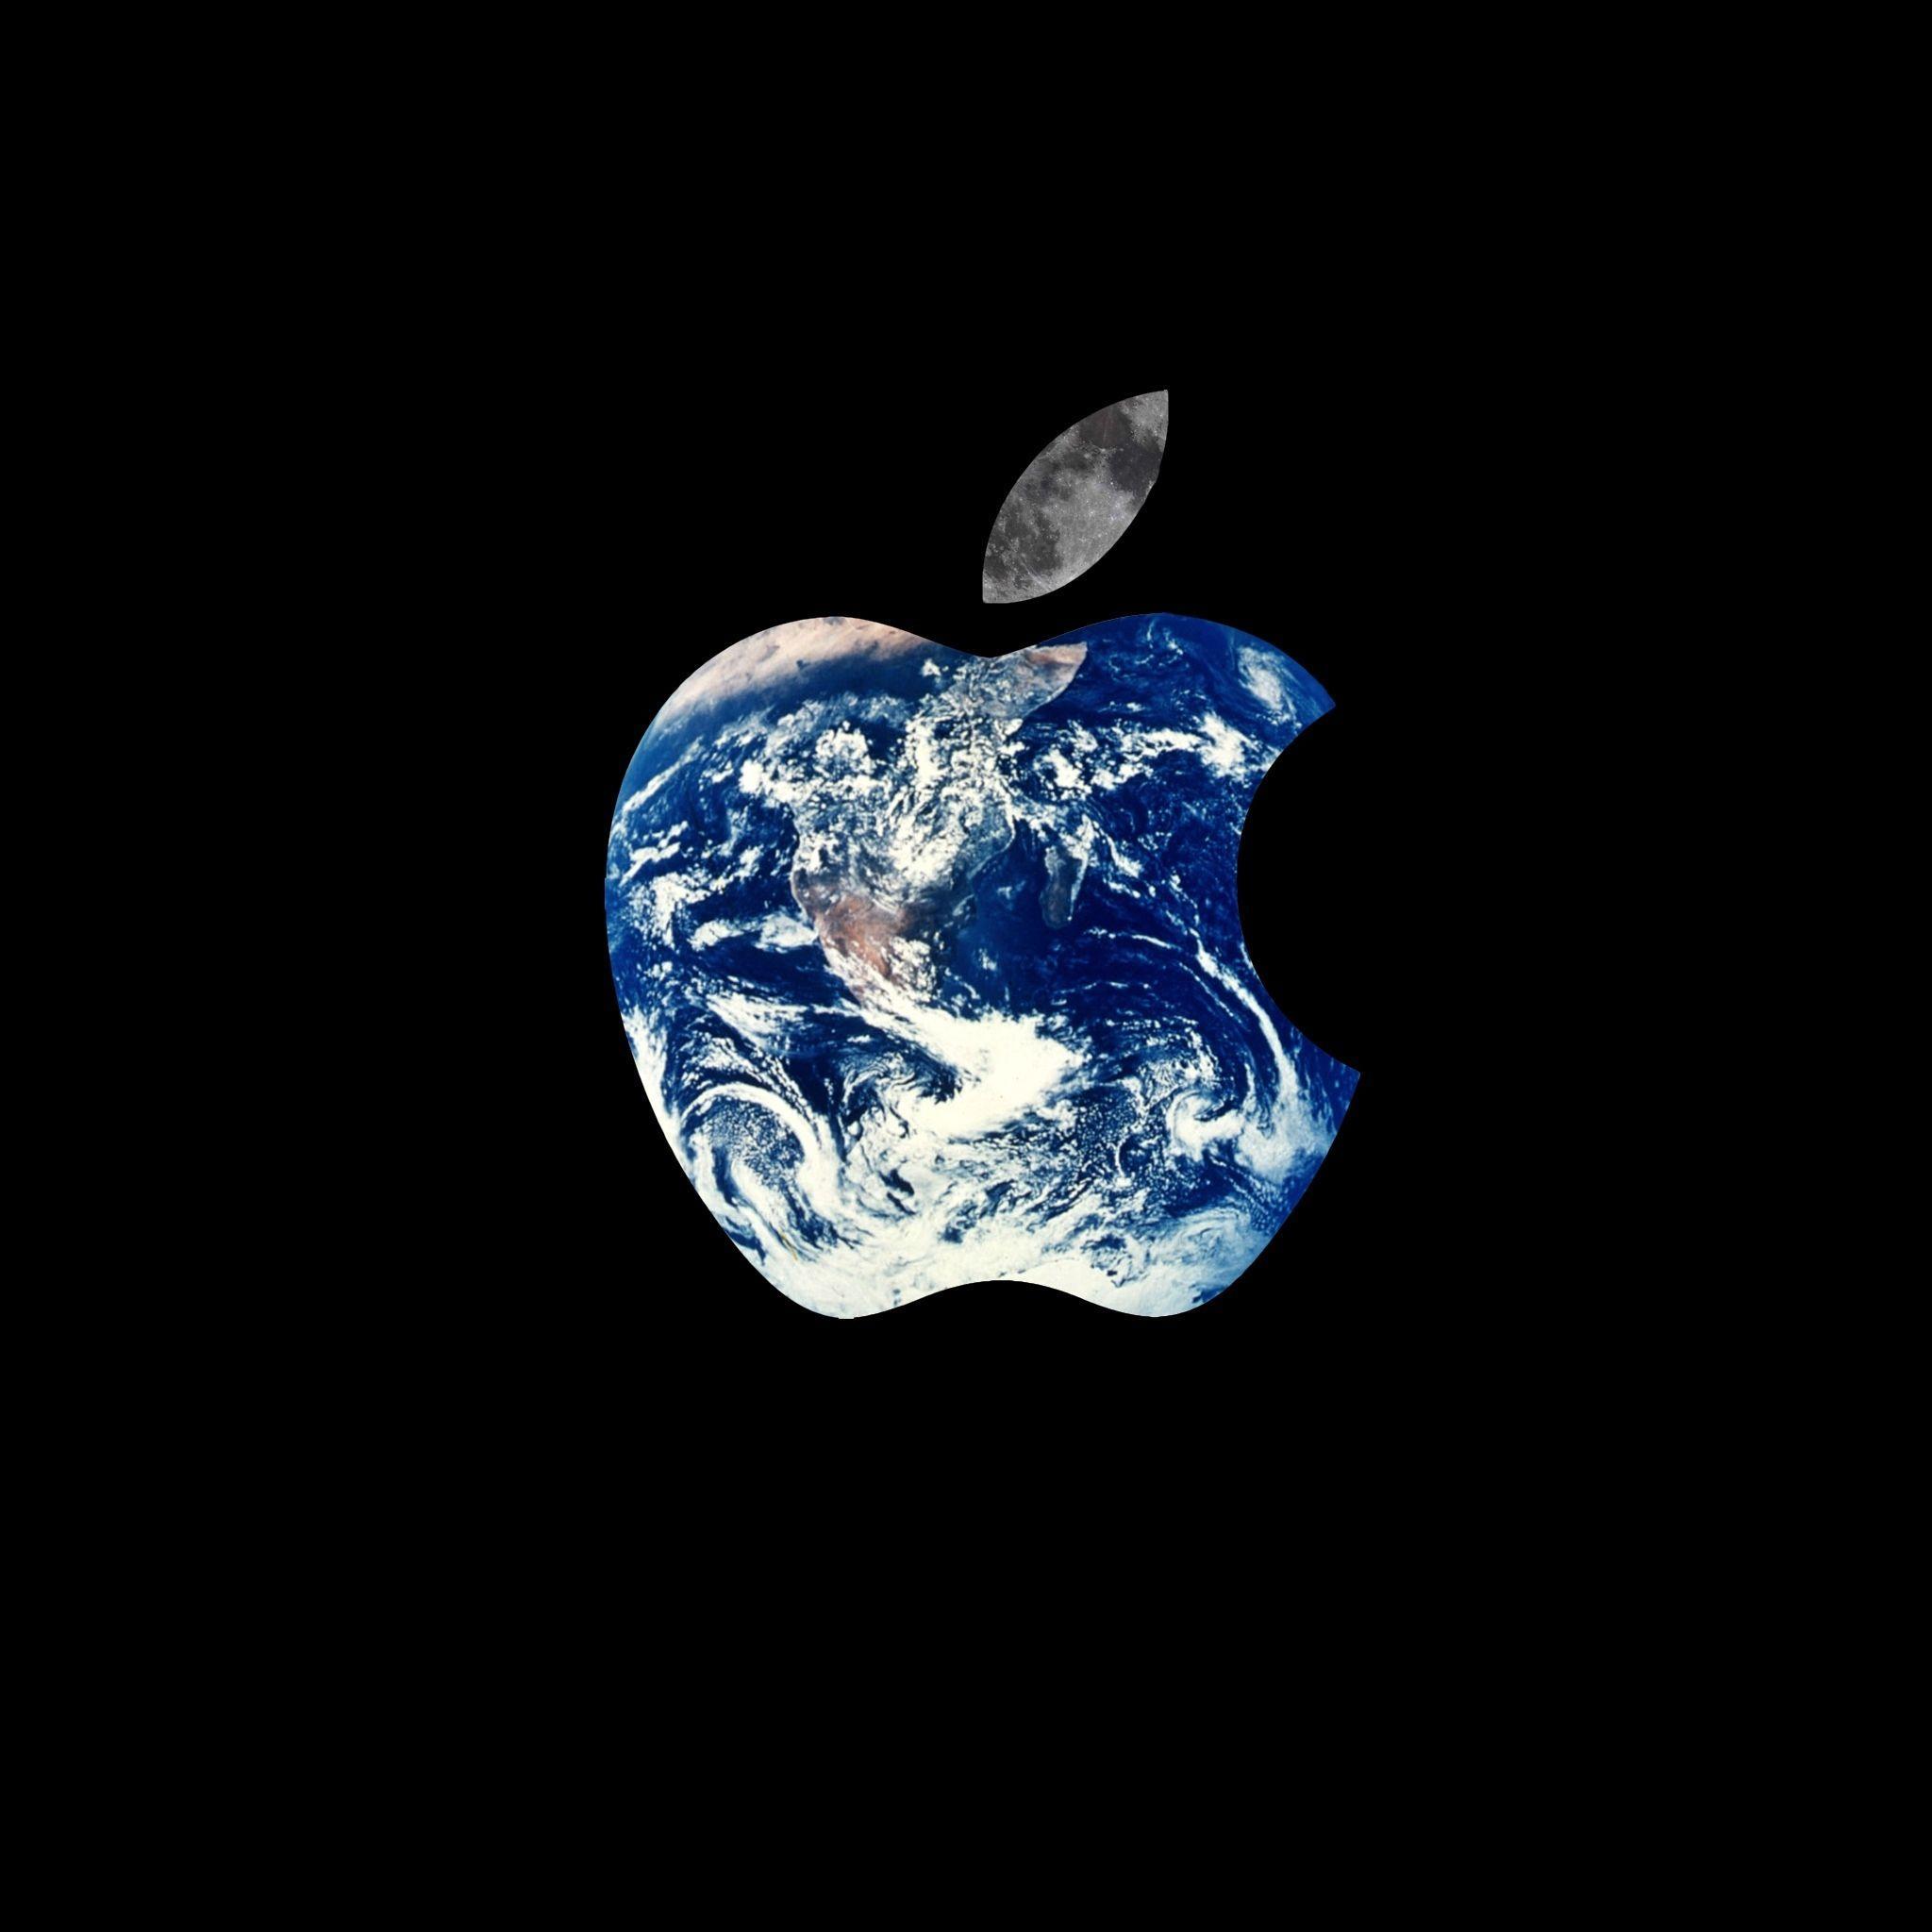 Download Kumpulan Wallpaper Apple For Ipad HD Paling Keren